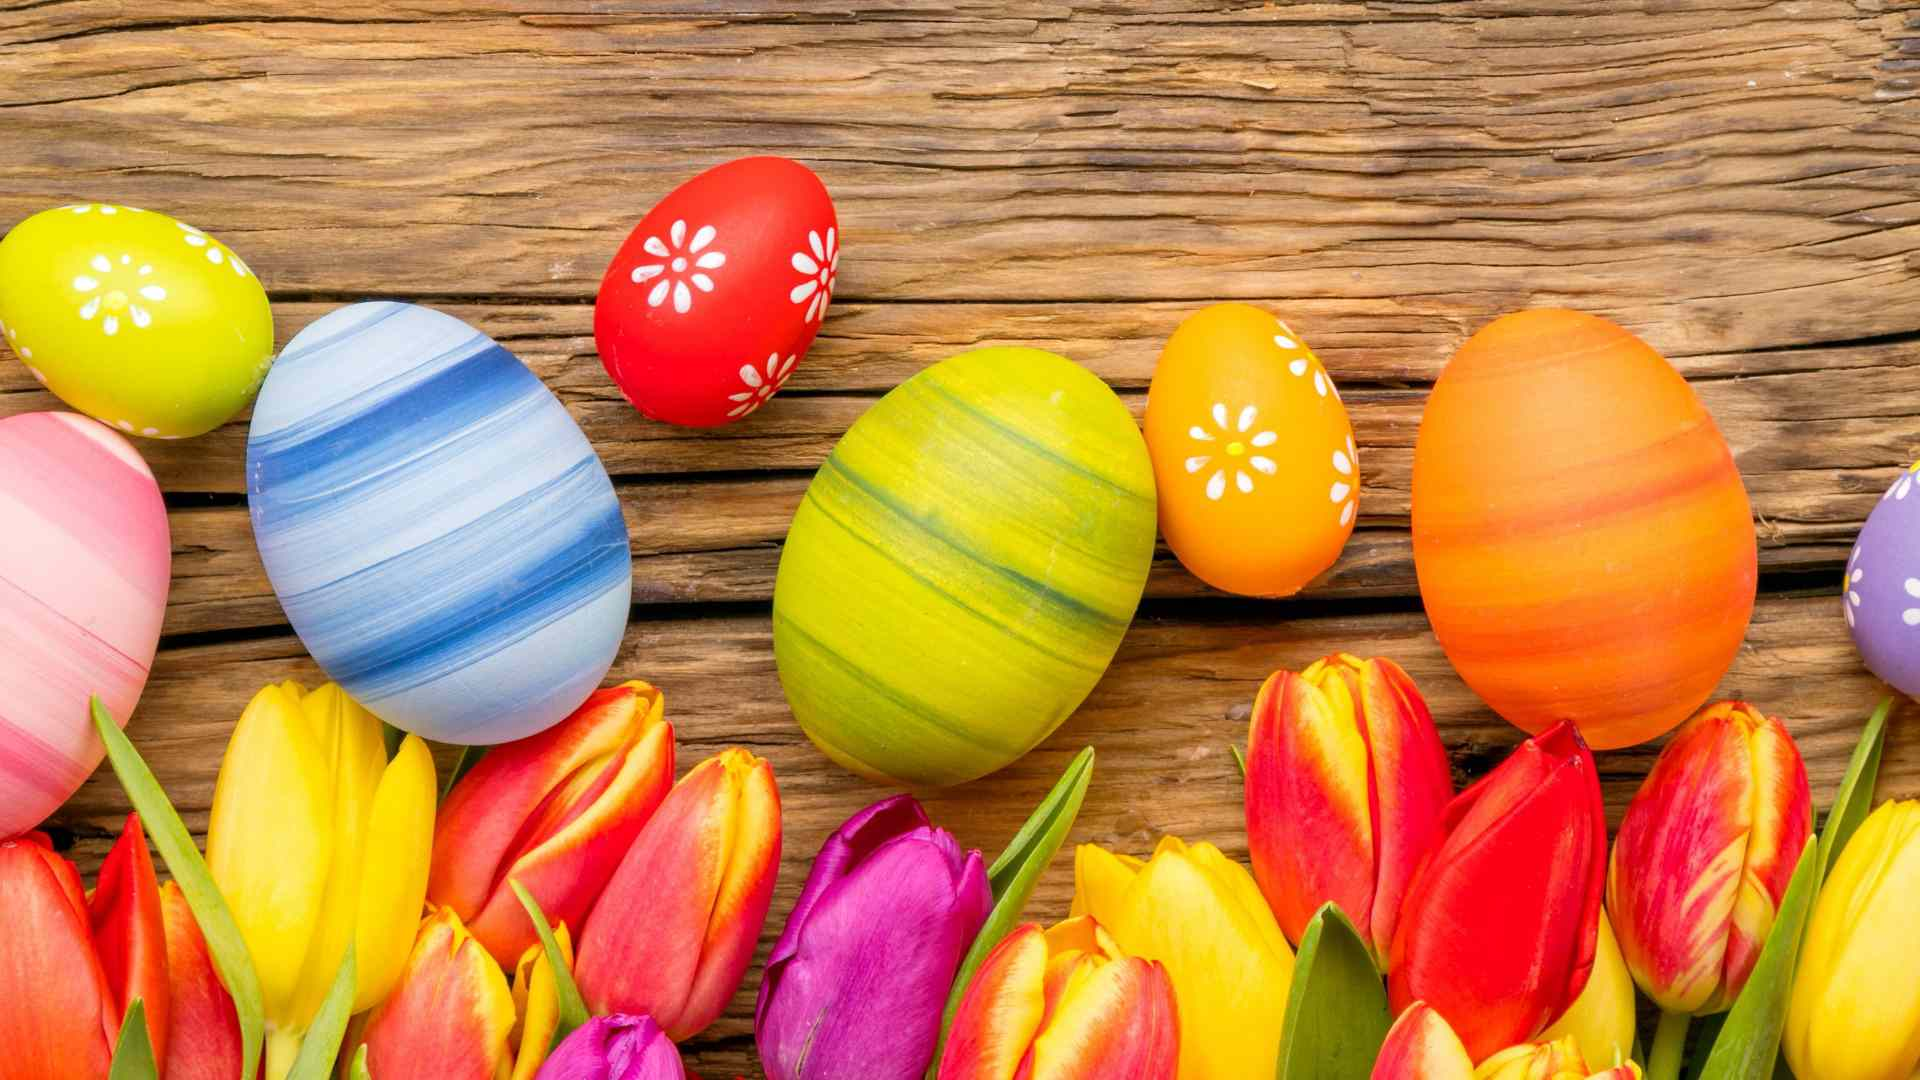 11 Beautiful and Easter Desktop Wallpapers 1920x1080